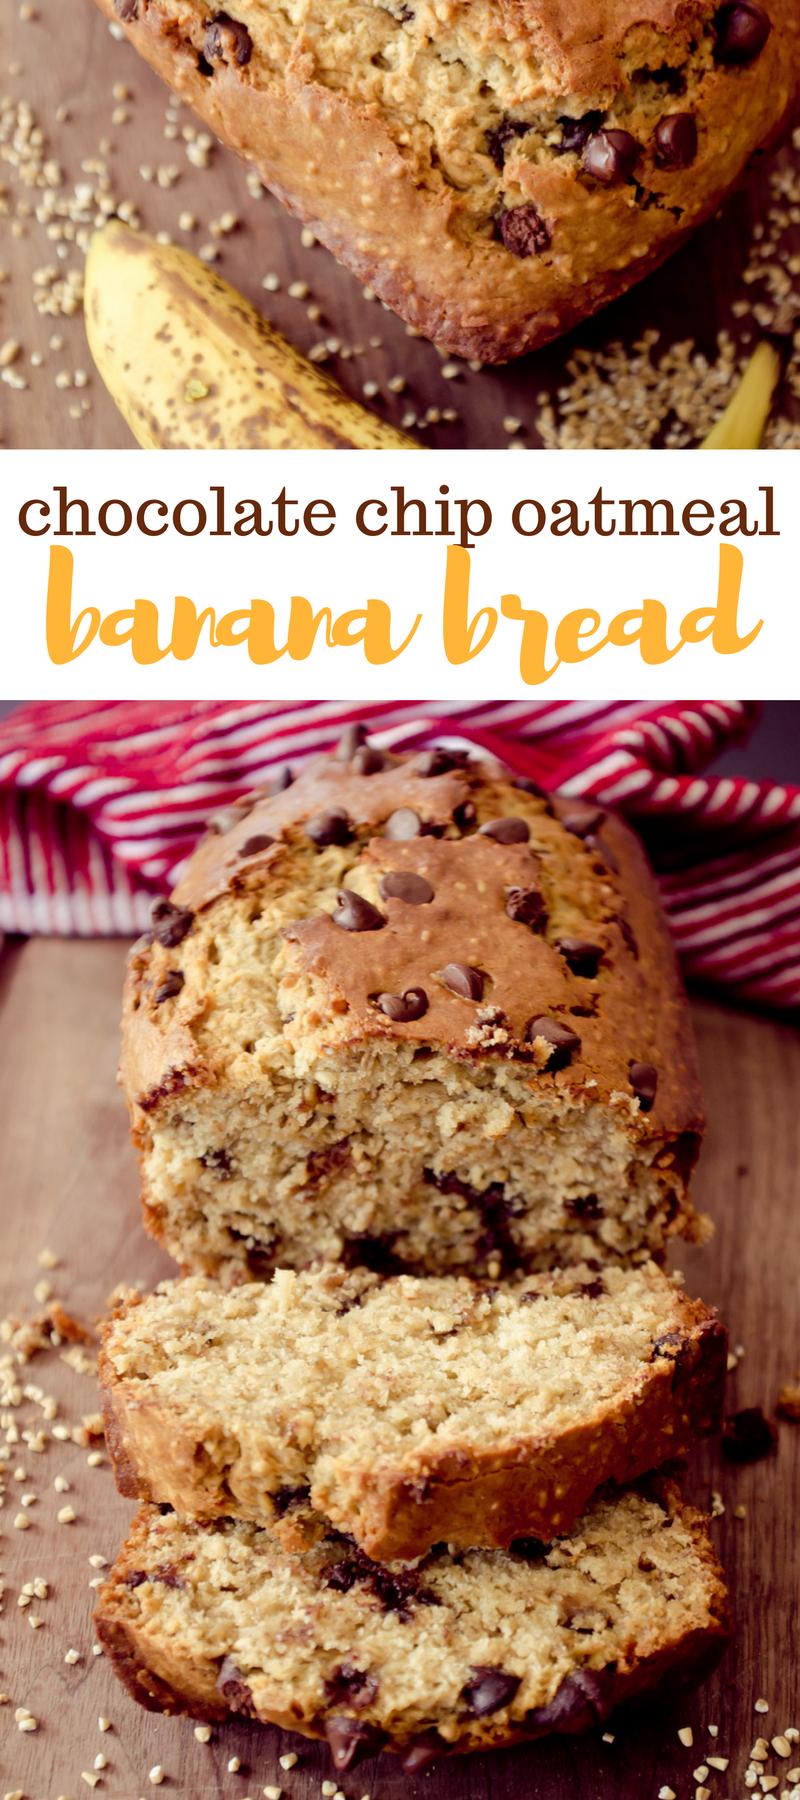 chocolate chip oatmeal banana bread (1)